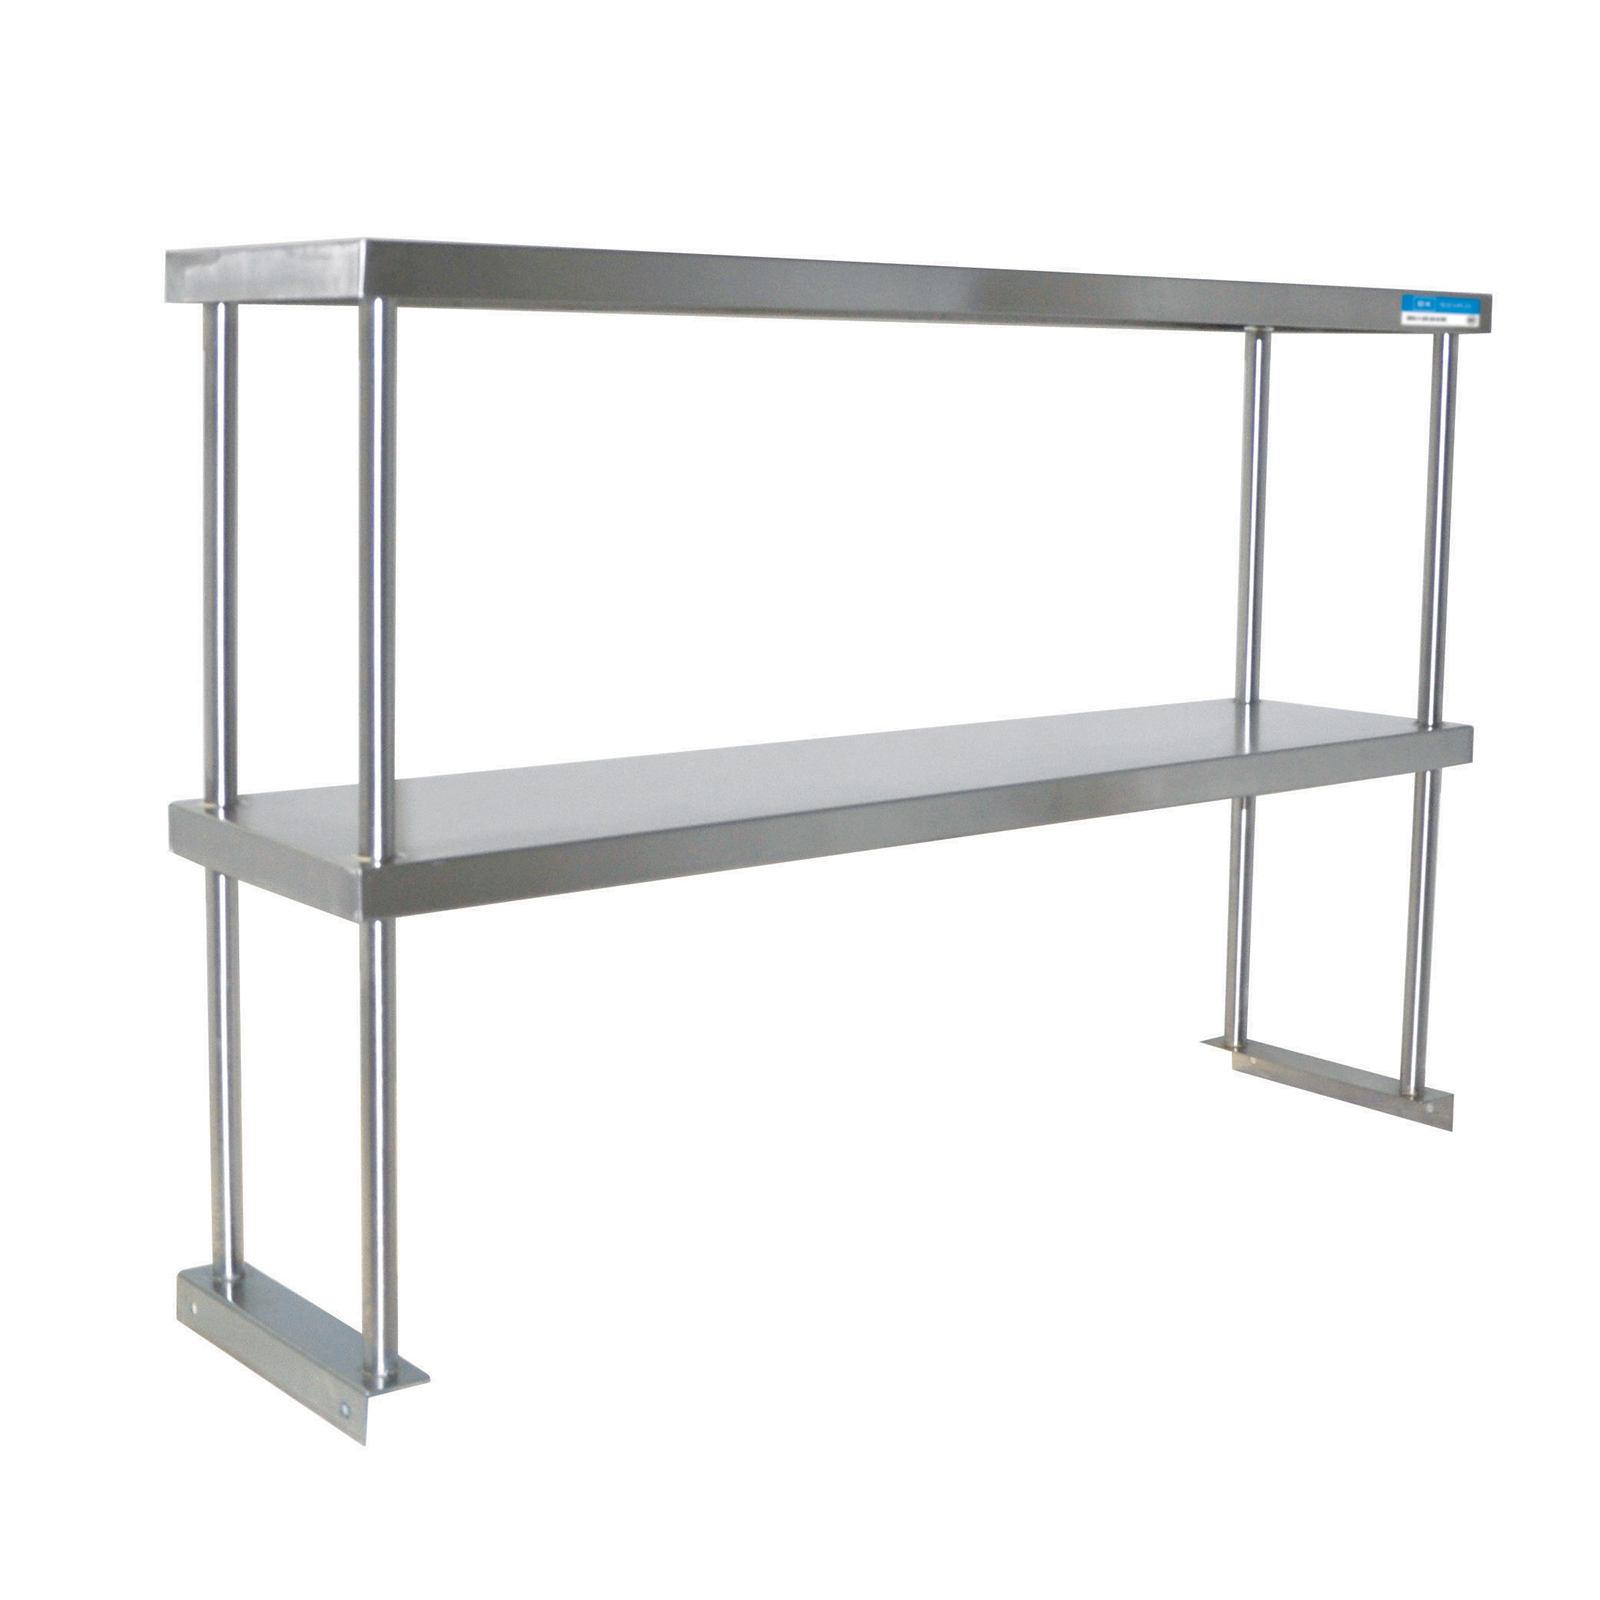 BK Resources BK-OSD-1296 overshelf, table-mounted